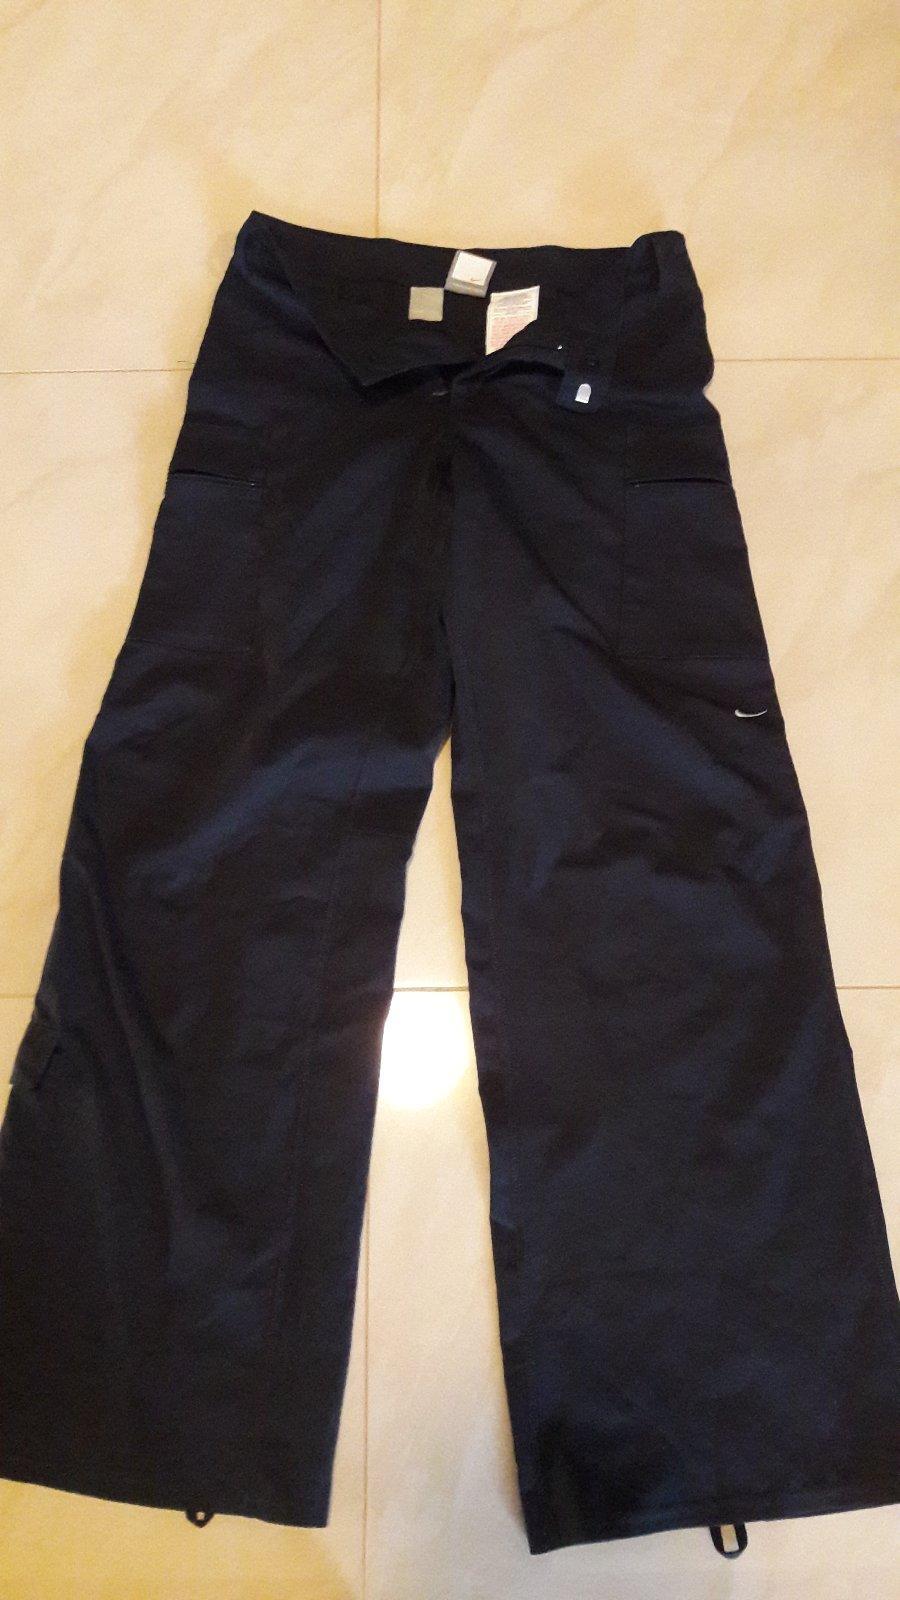 57bfb02e17cd Športové nohavice